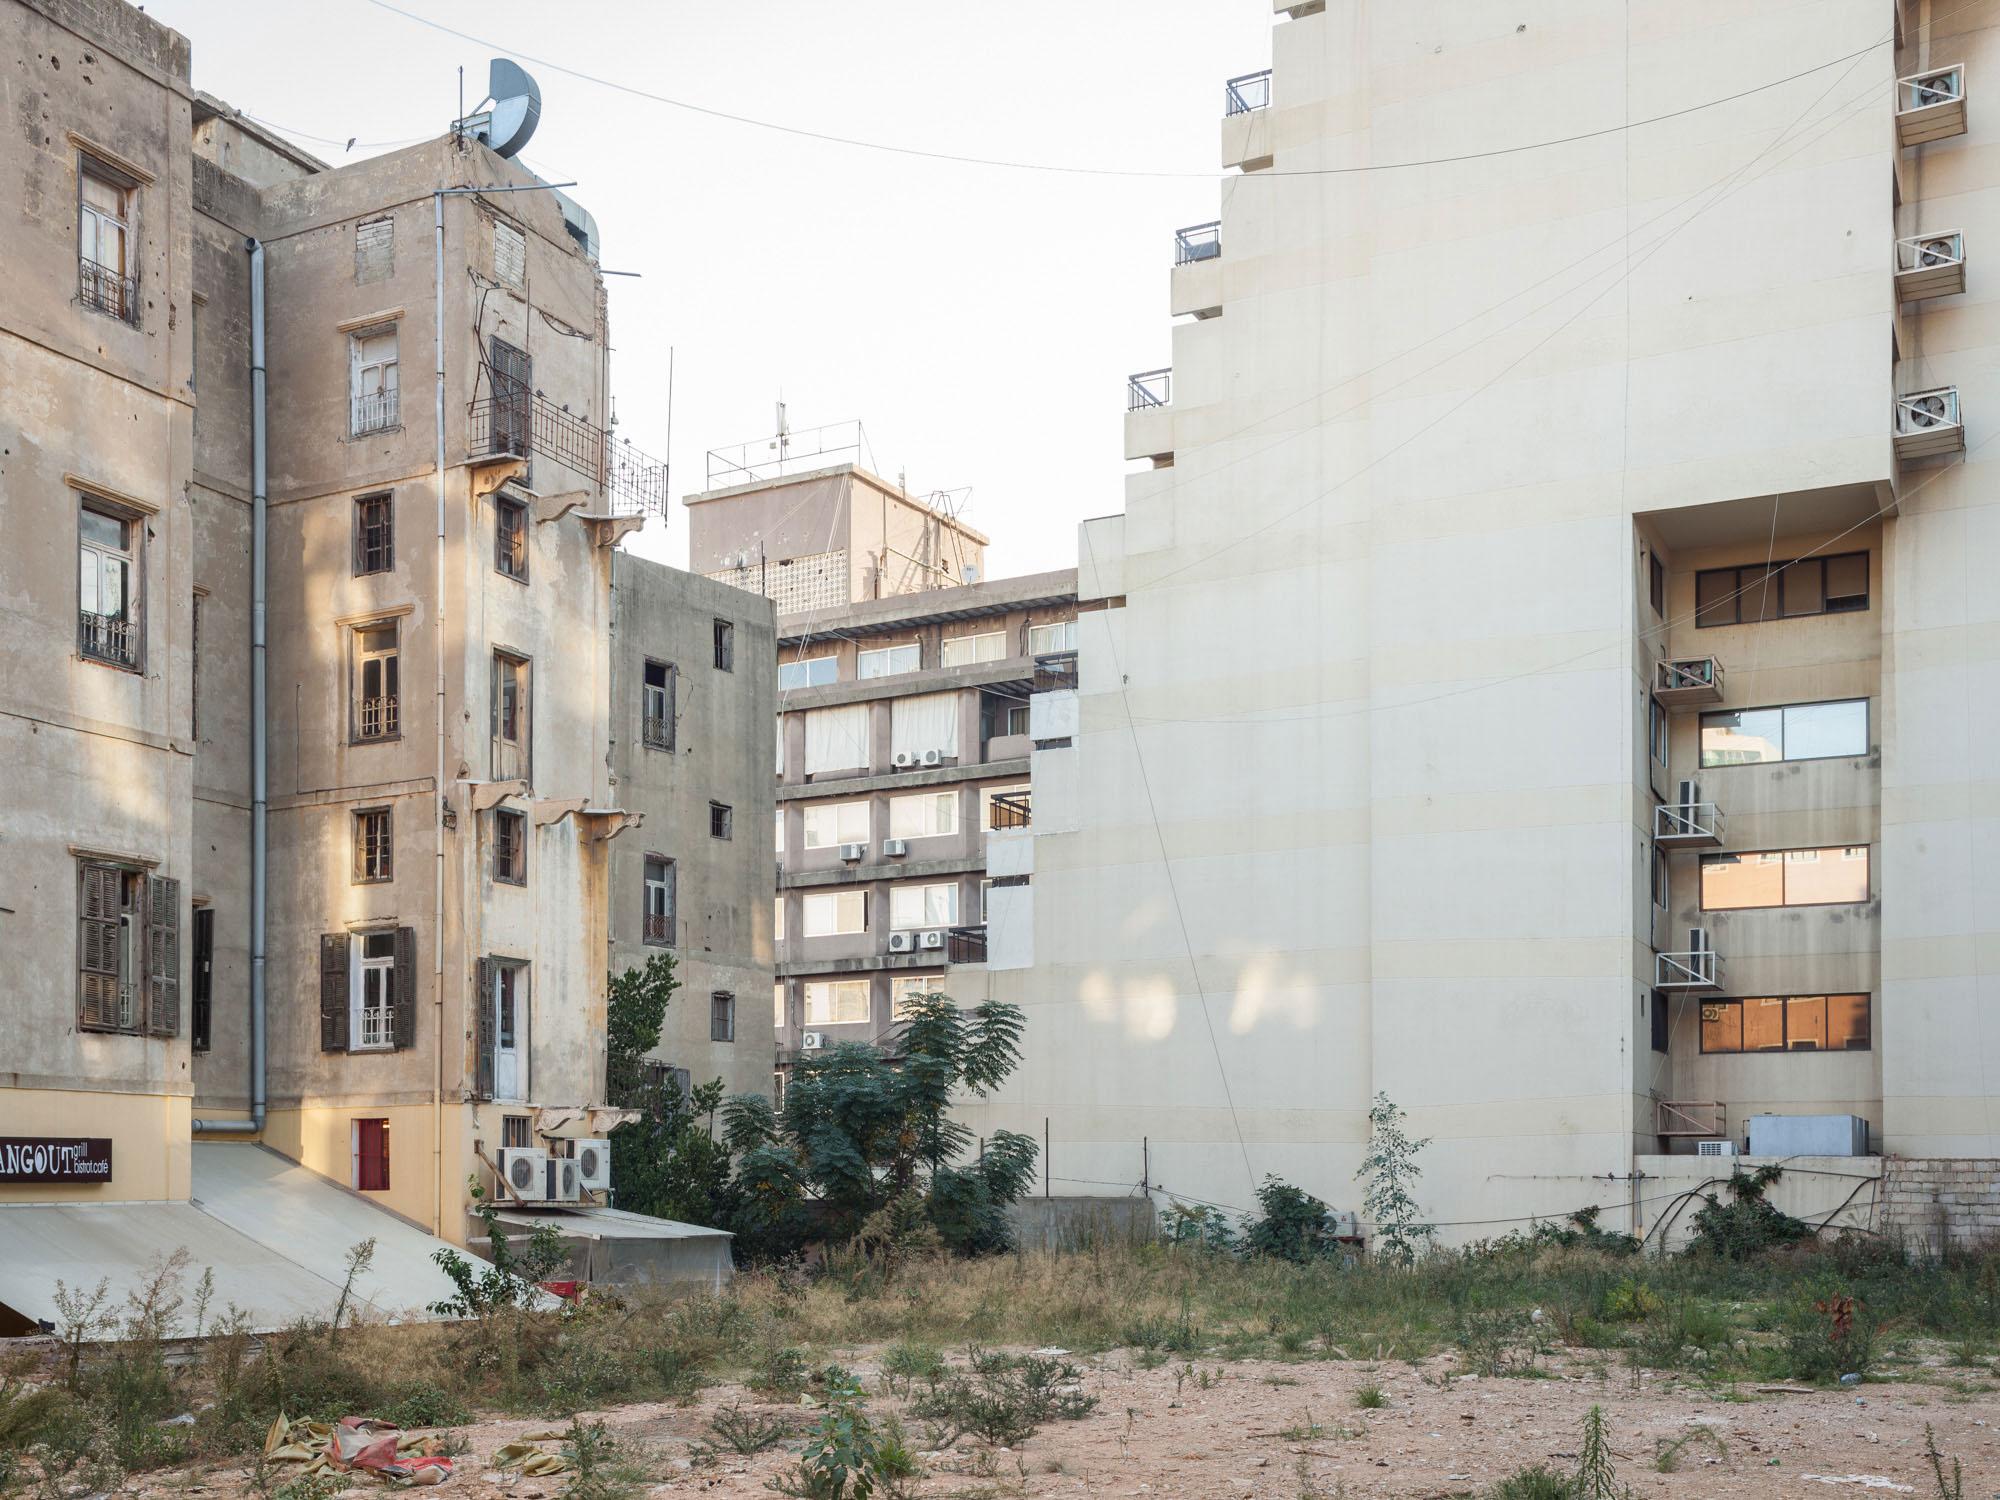 Beirut-7567.jpg